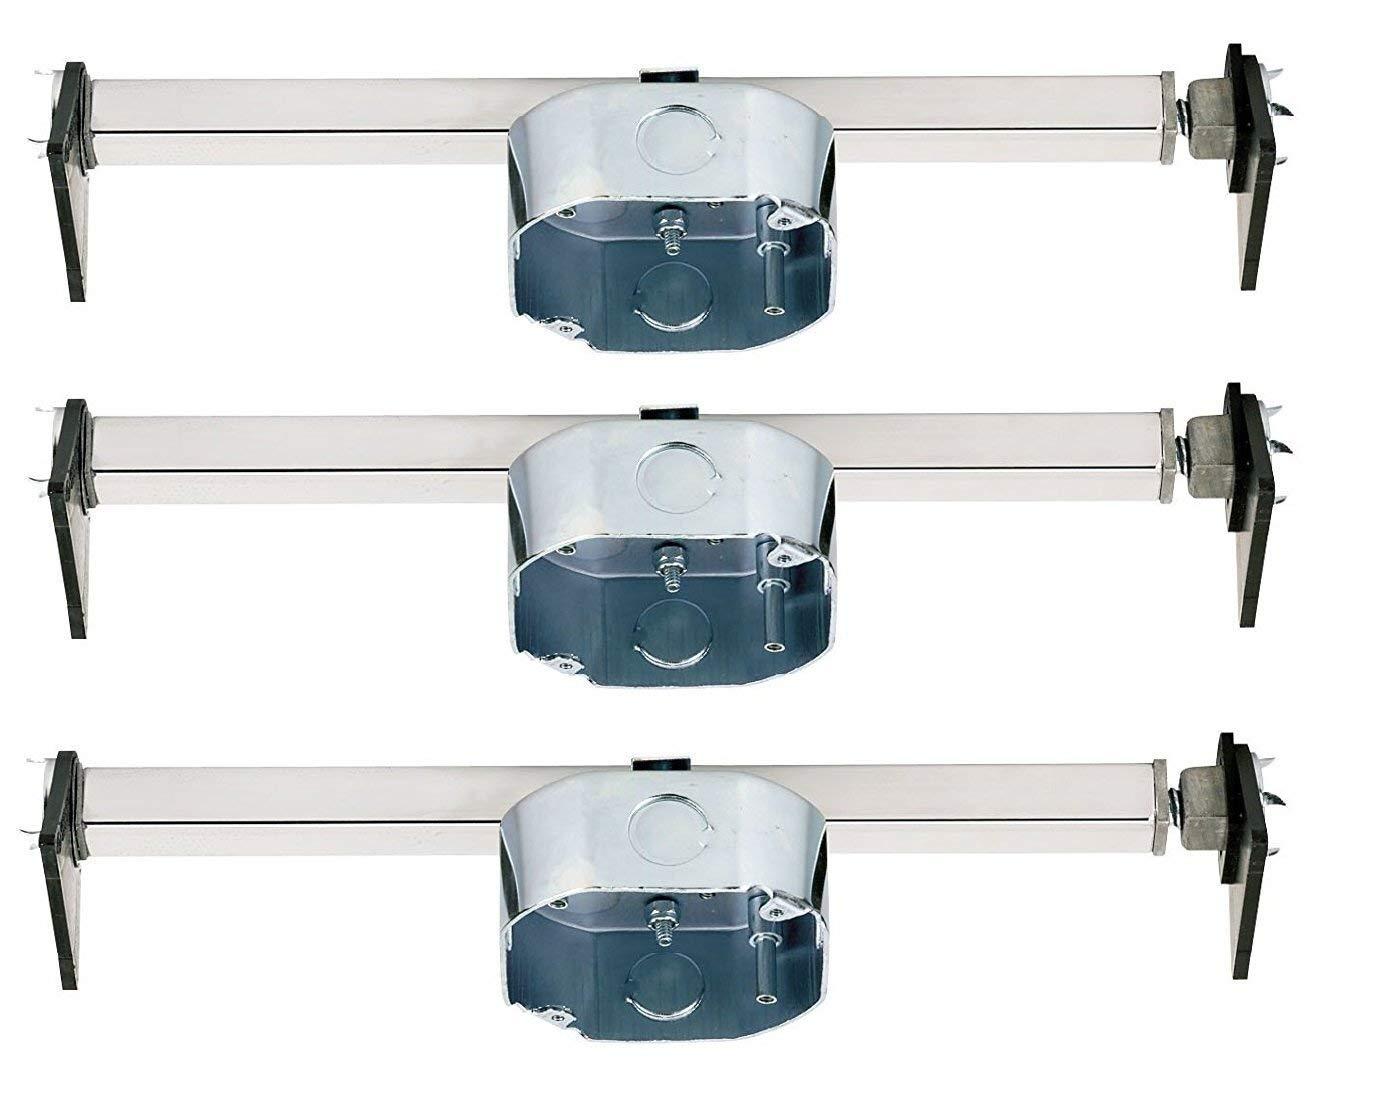 Pack of 2 Westinghouse Saf-T-Brace for Ceiling Fans